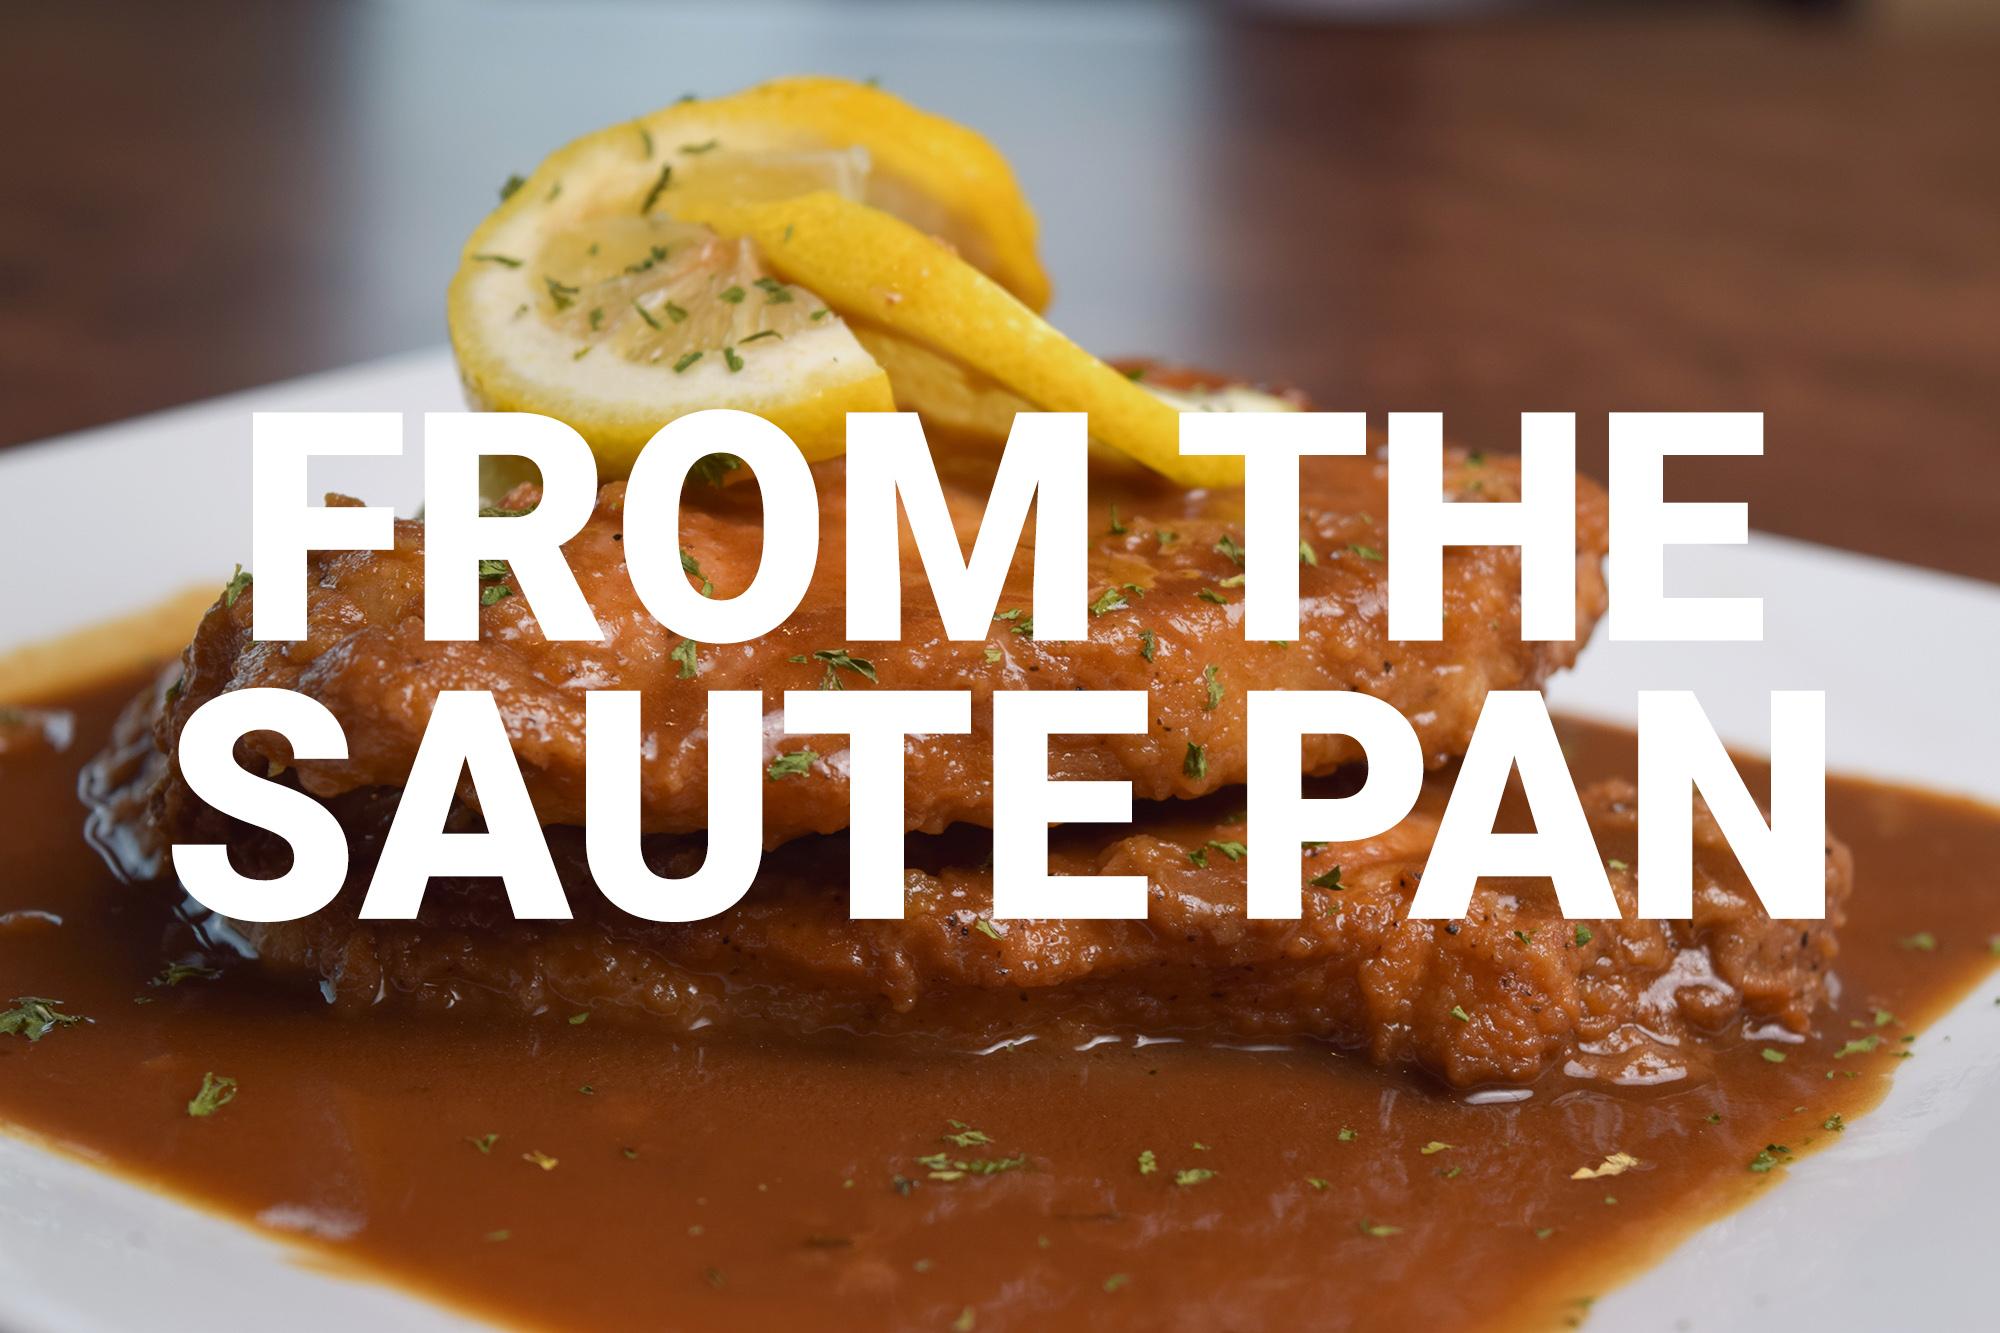 Spiro's Taverna Sauteed